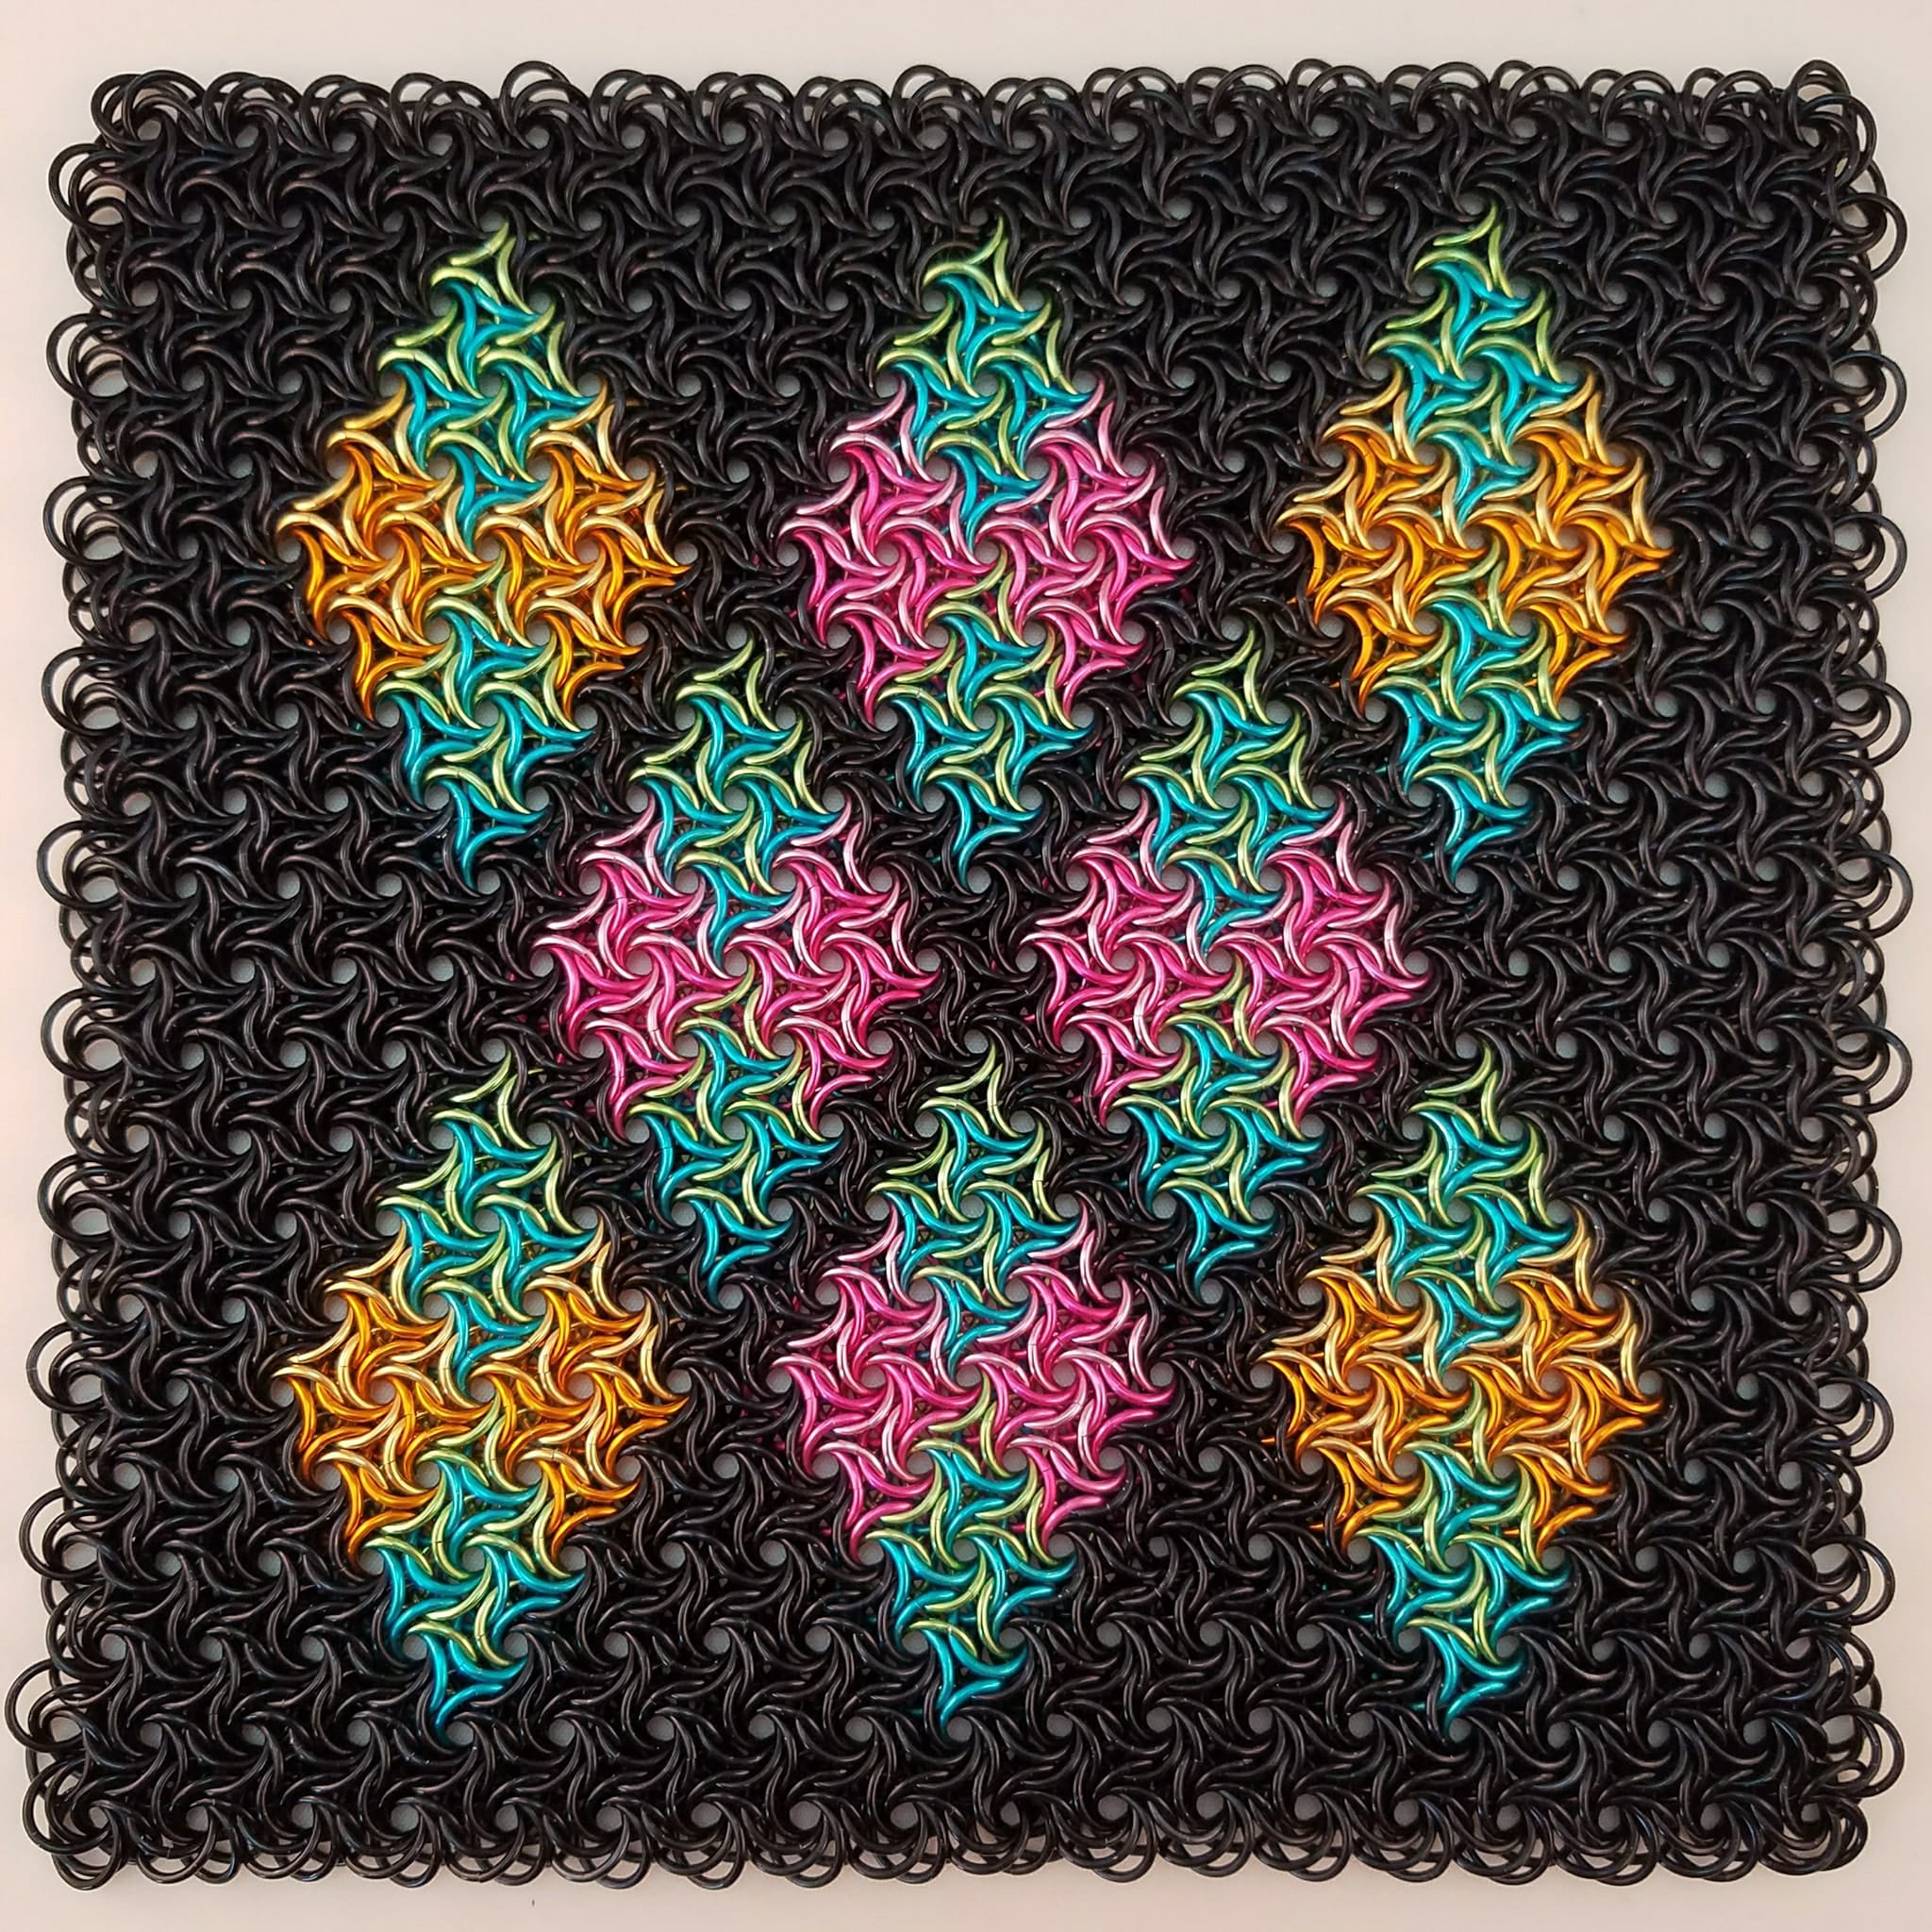 Black square of moorish rose with colorful diamond shaped inlay